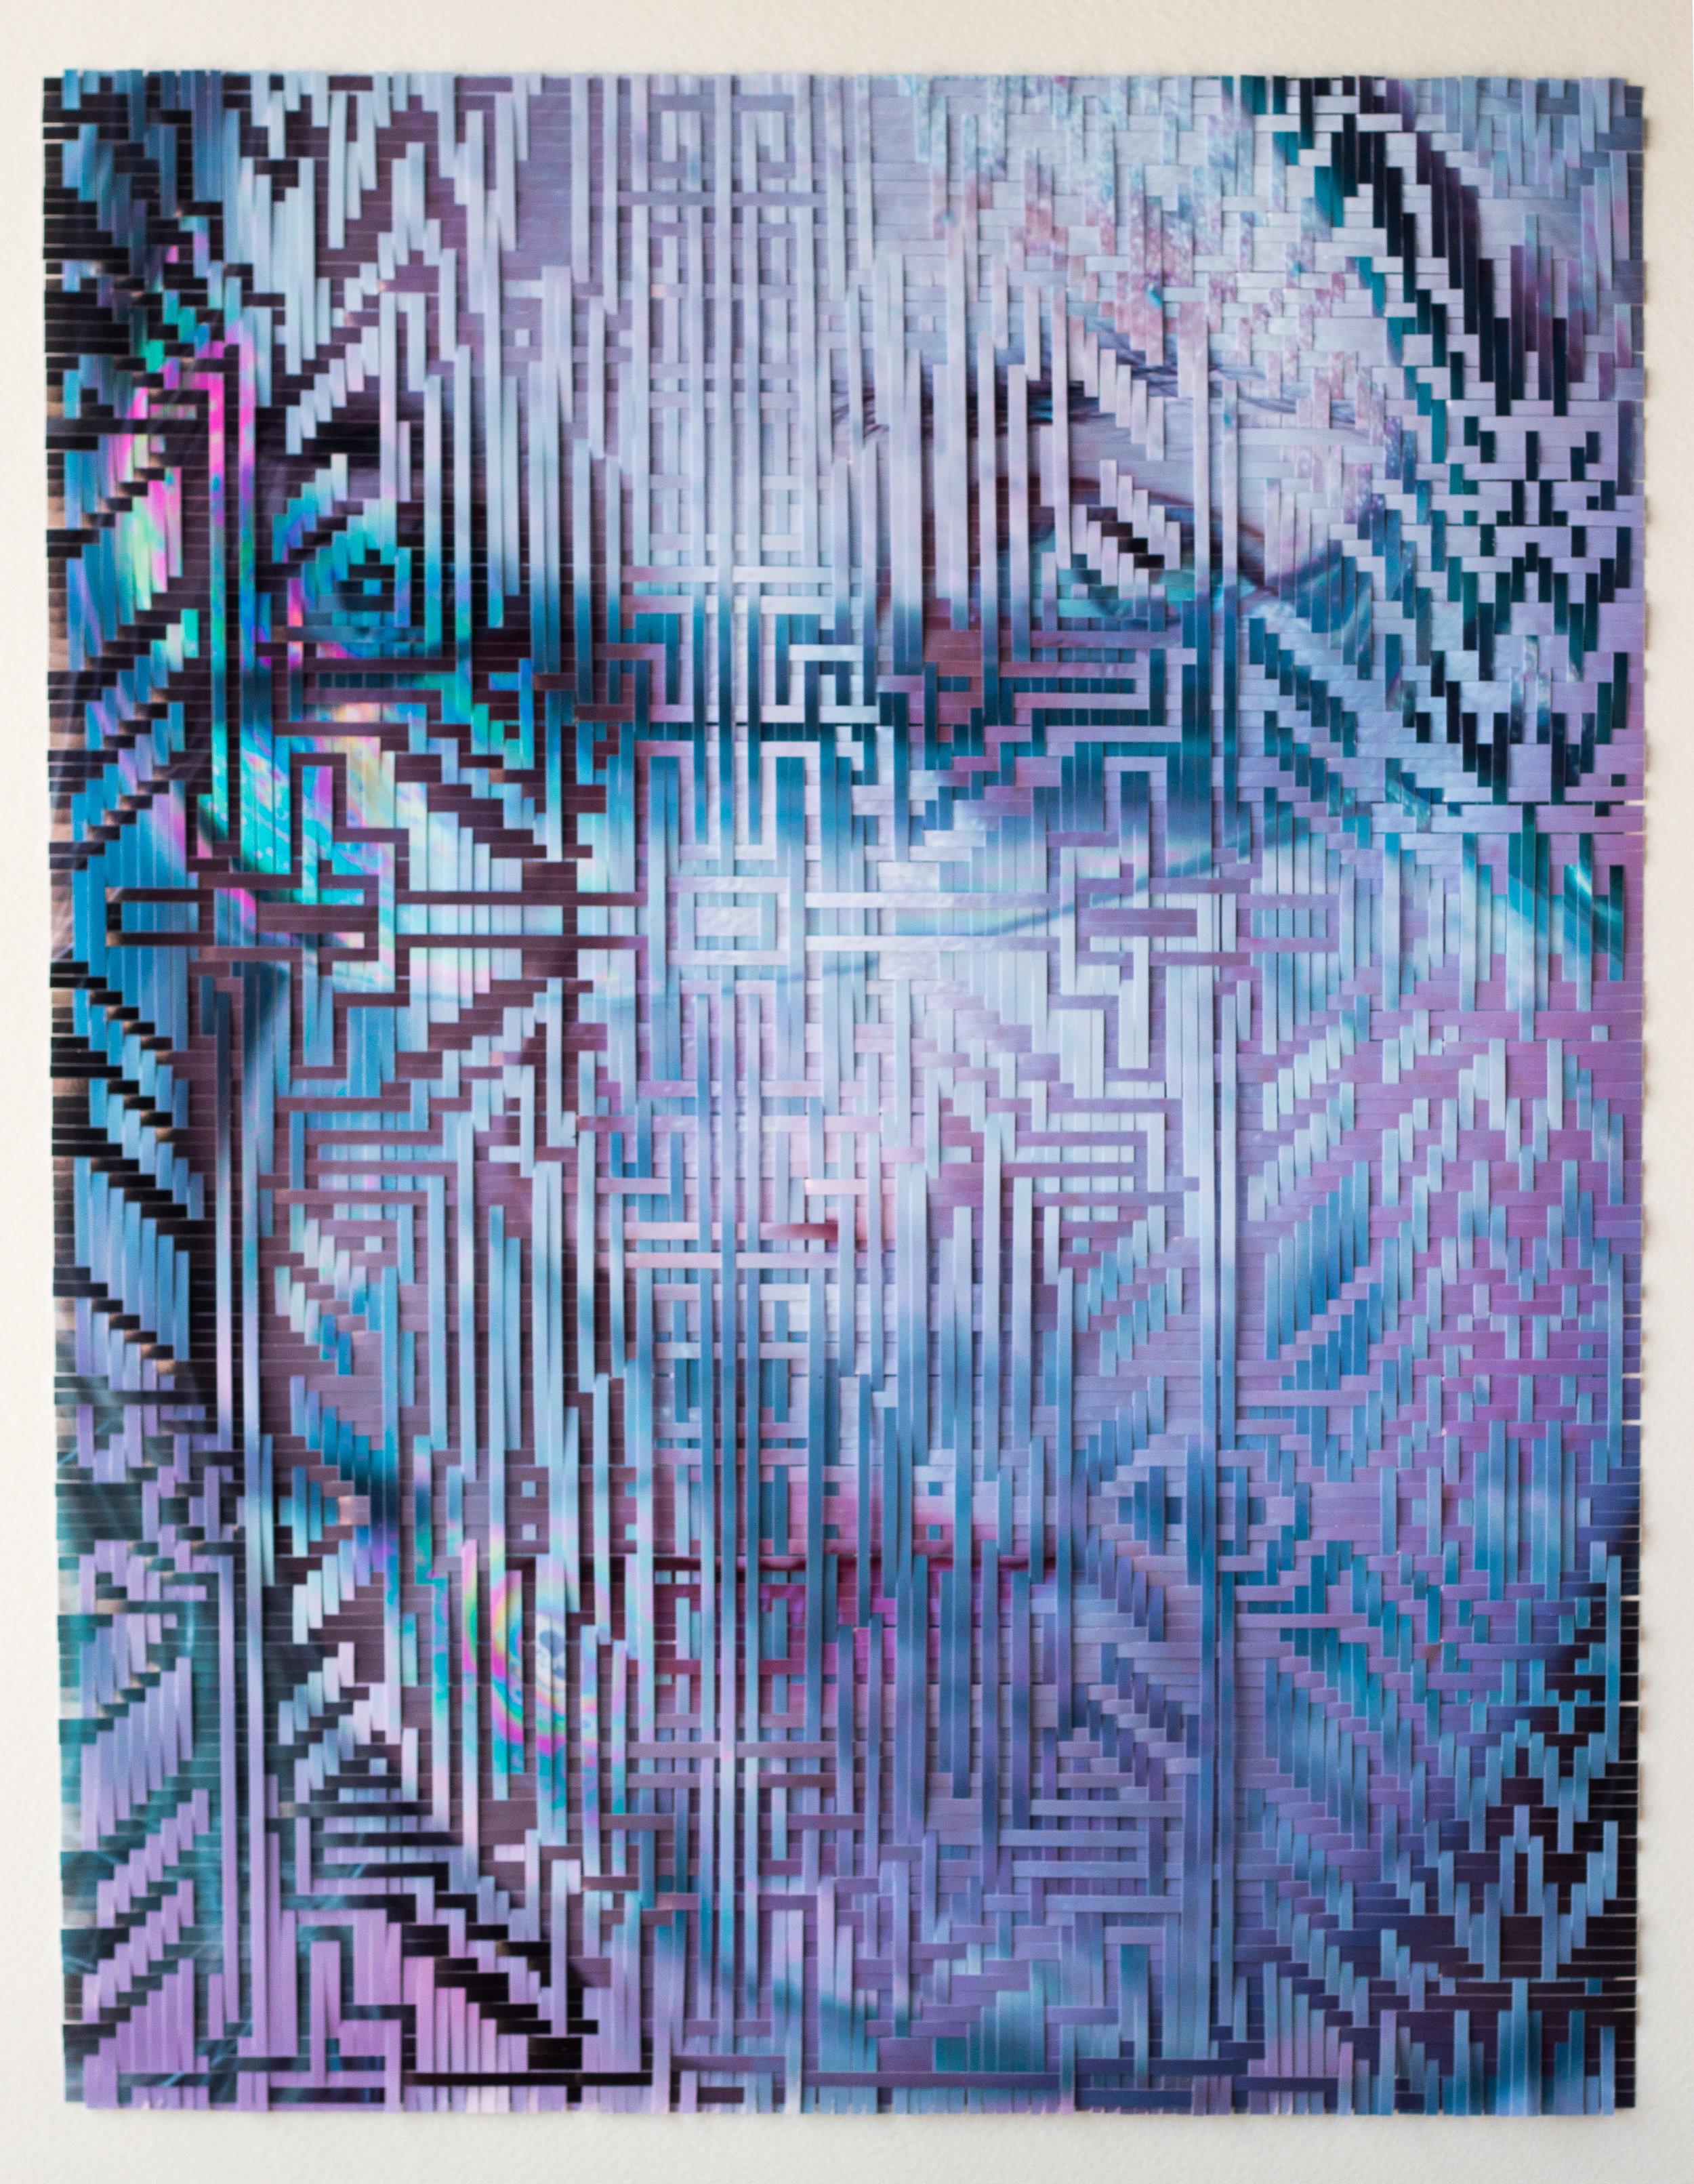 Spectral Body, 15x19_, 2018.  $1500 unframed.jpg